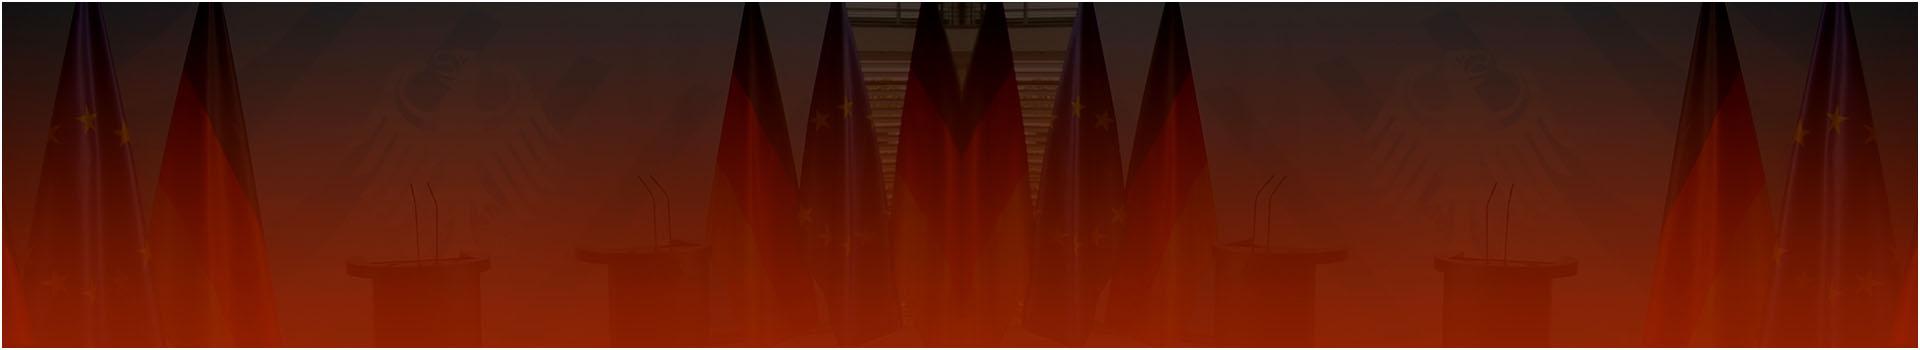 CME-CNE Banner